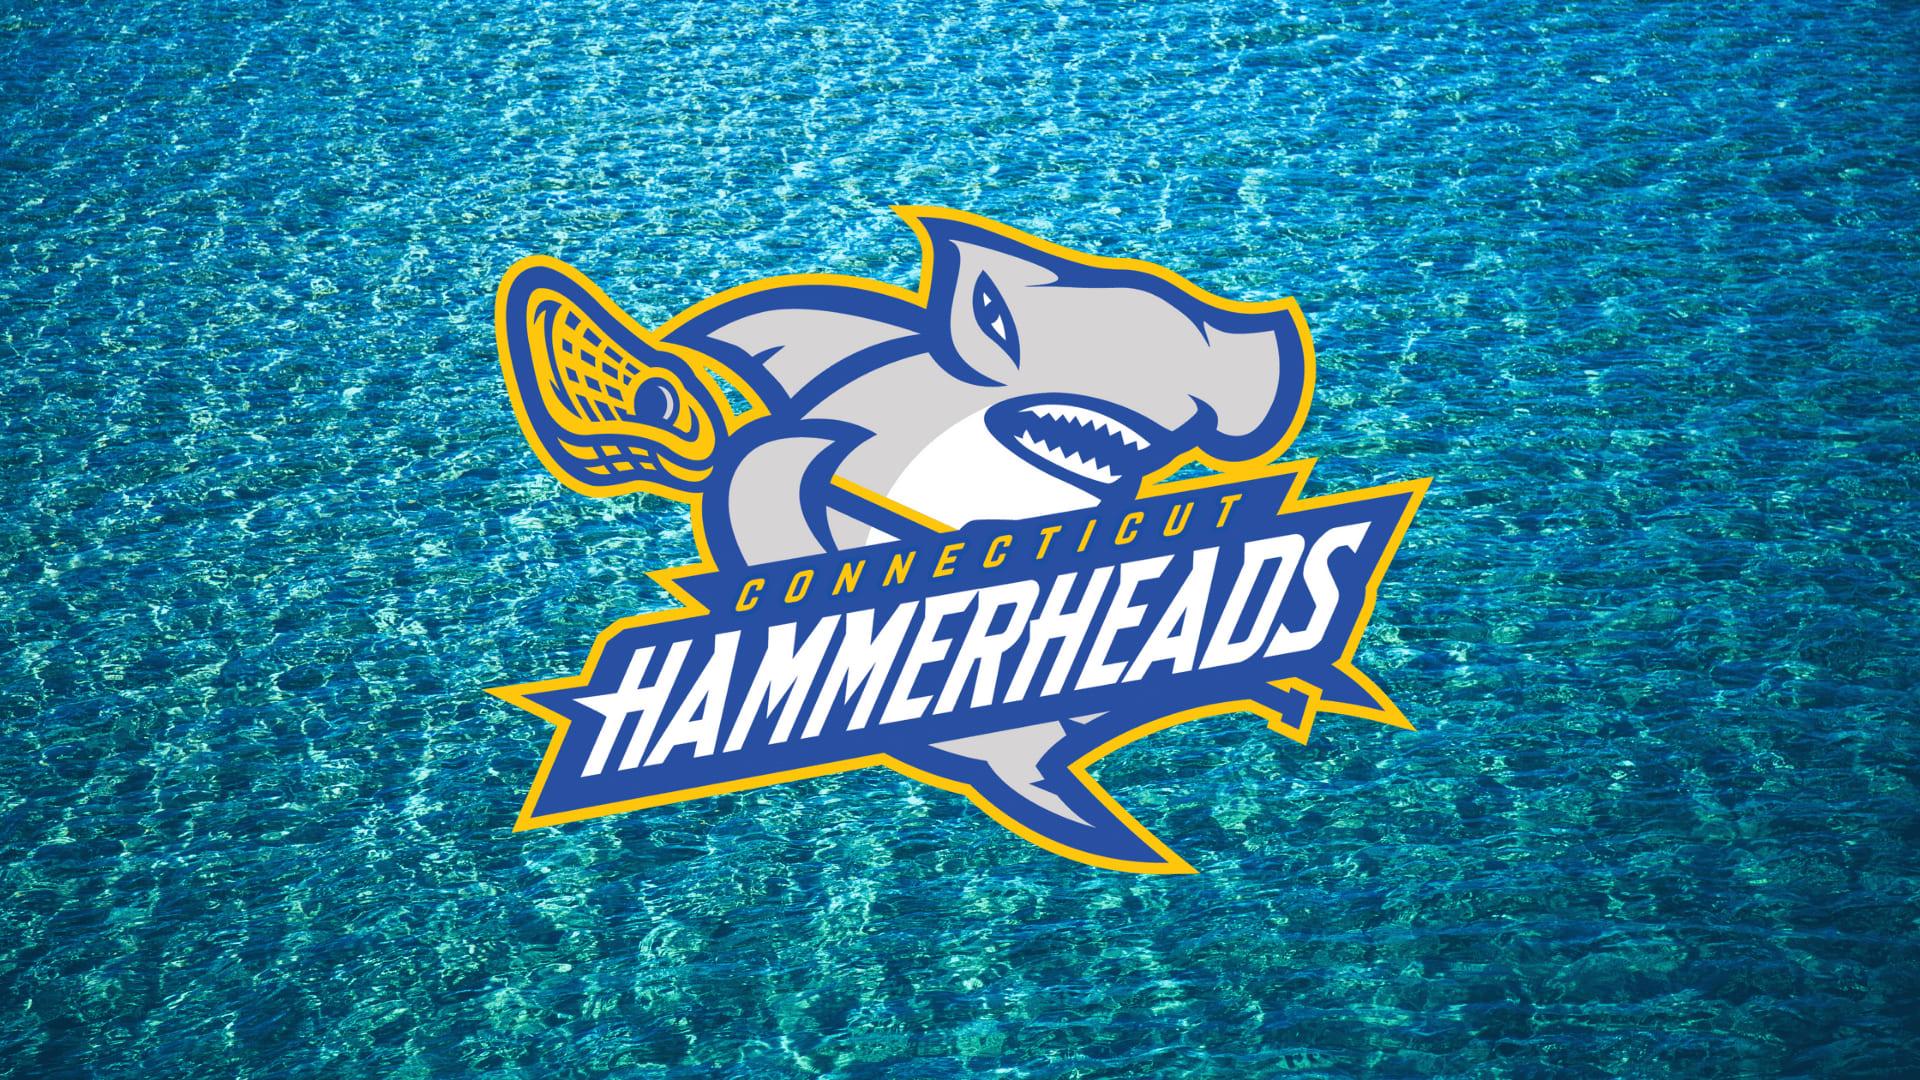 connecticut hammerheads mll major league lacrosse